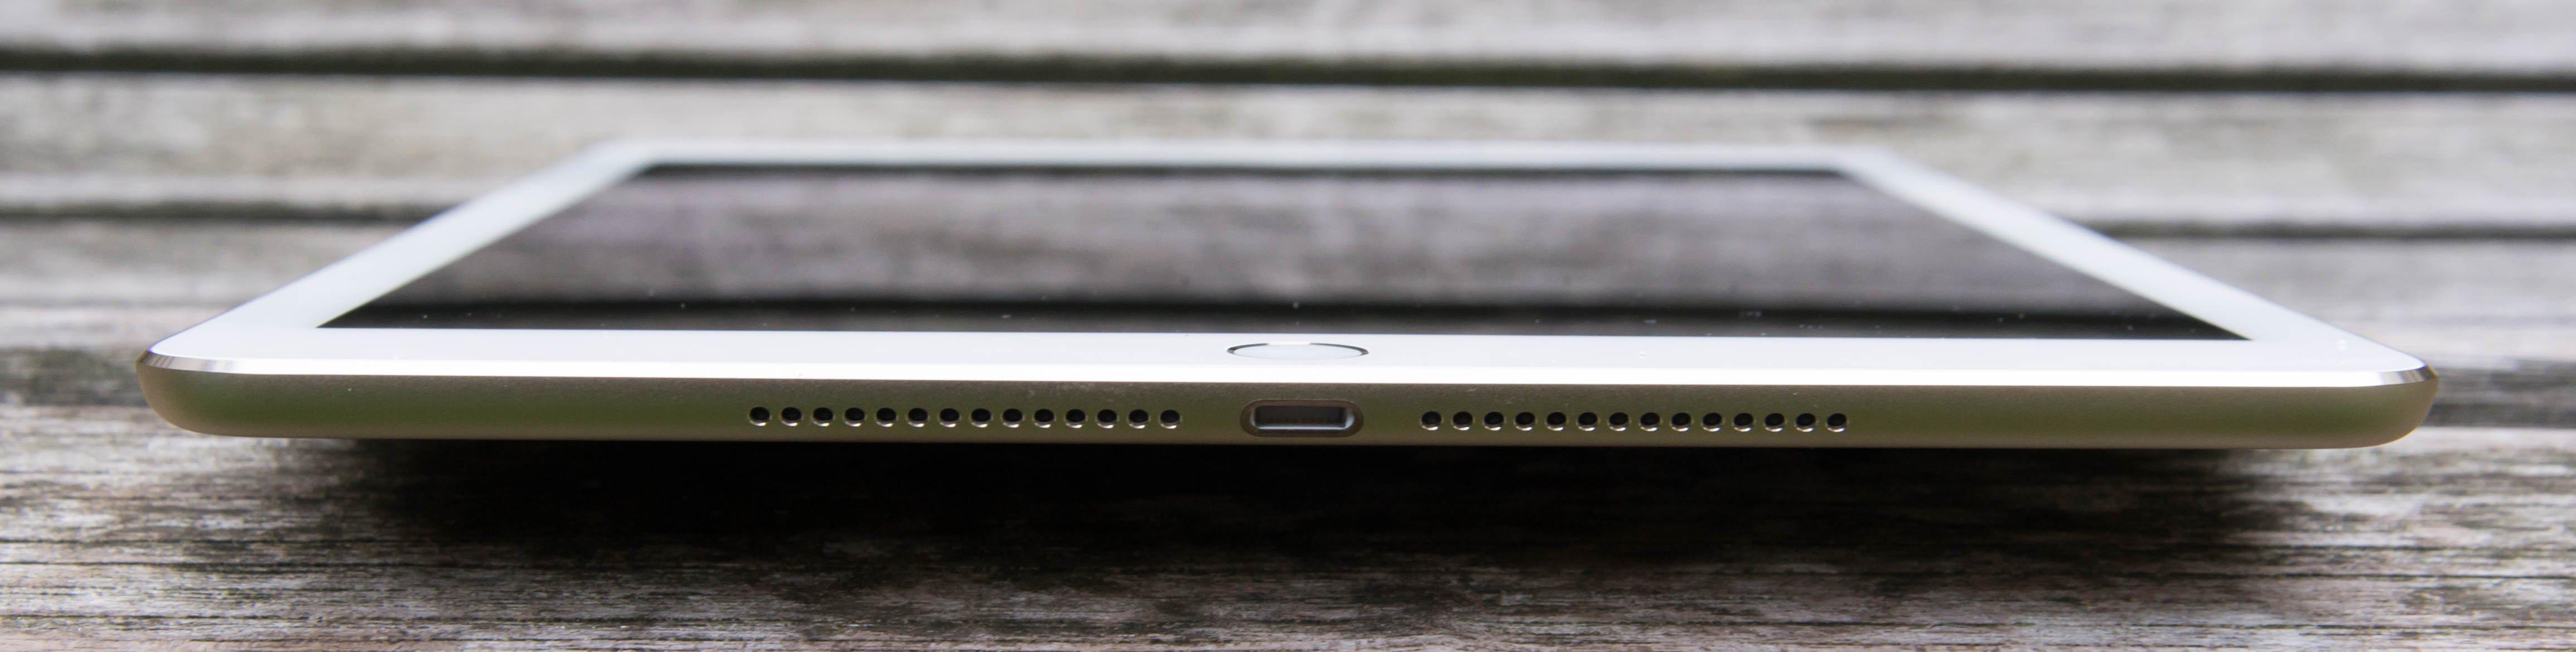 iPad Air 2 review gallery | Expert Reviews